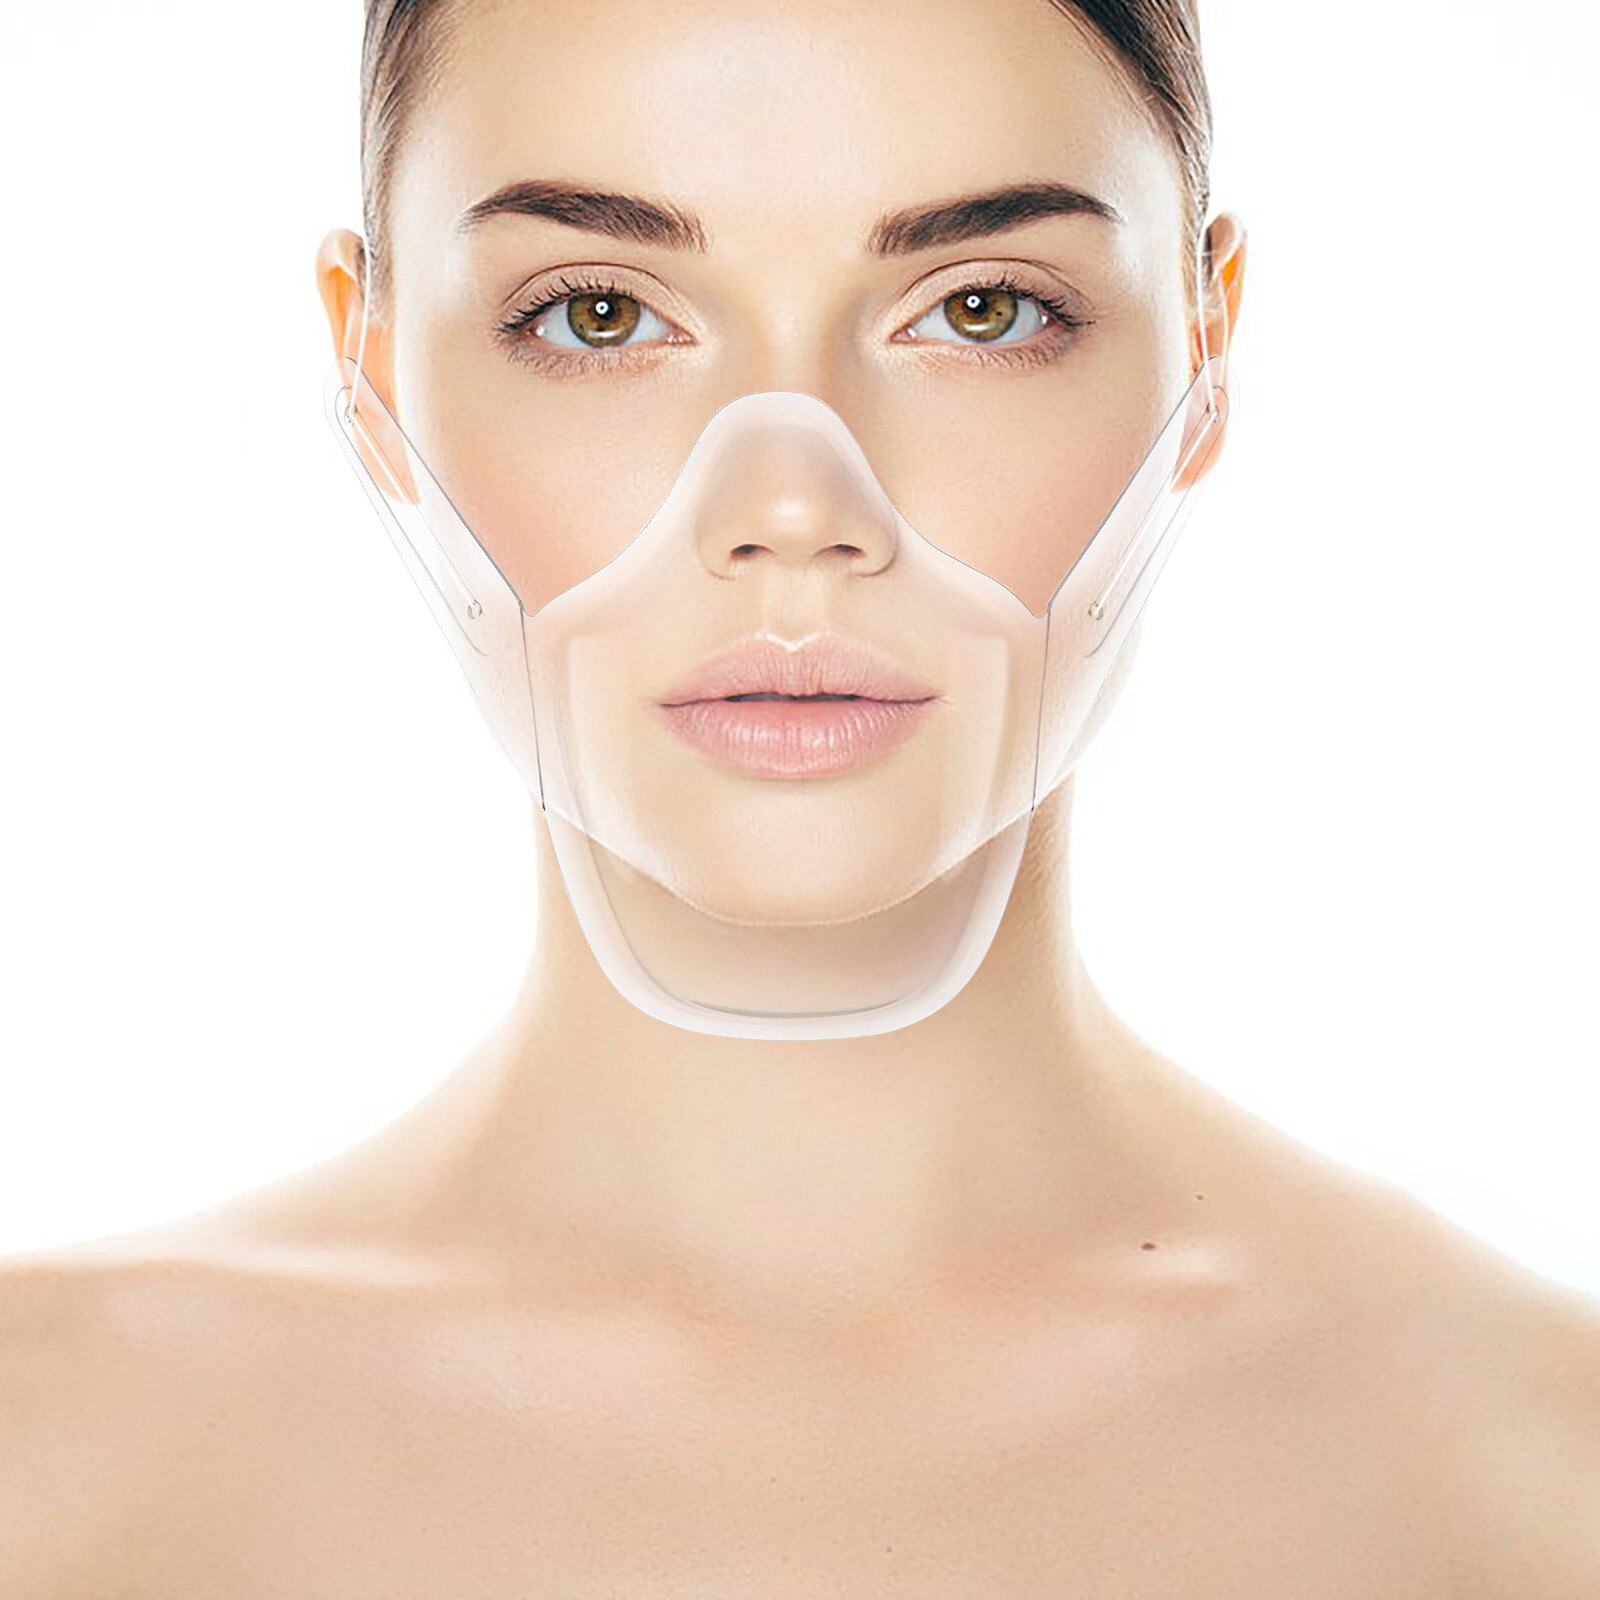 Transparent visible lip language reusable face shield PET mask Prevent oil splash Durable mouth Mask cover Shield Mascarilla 5PC